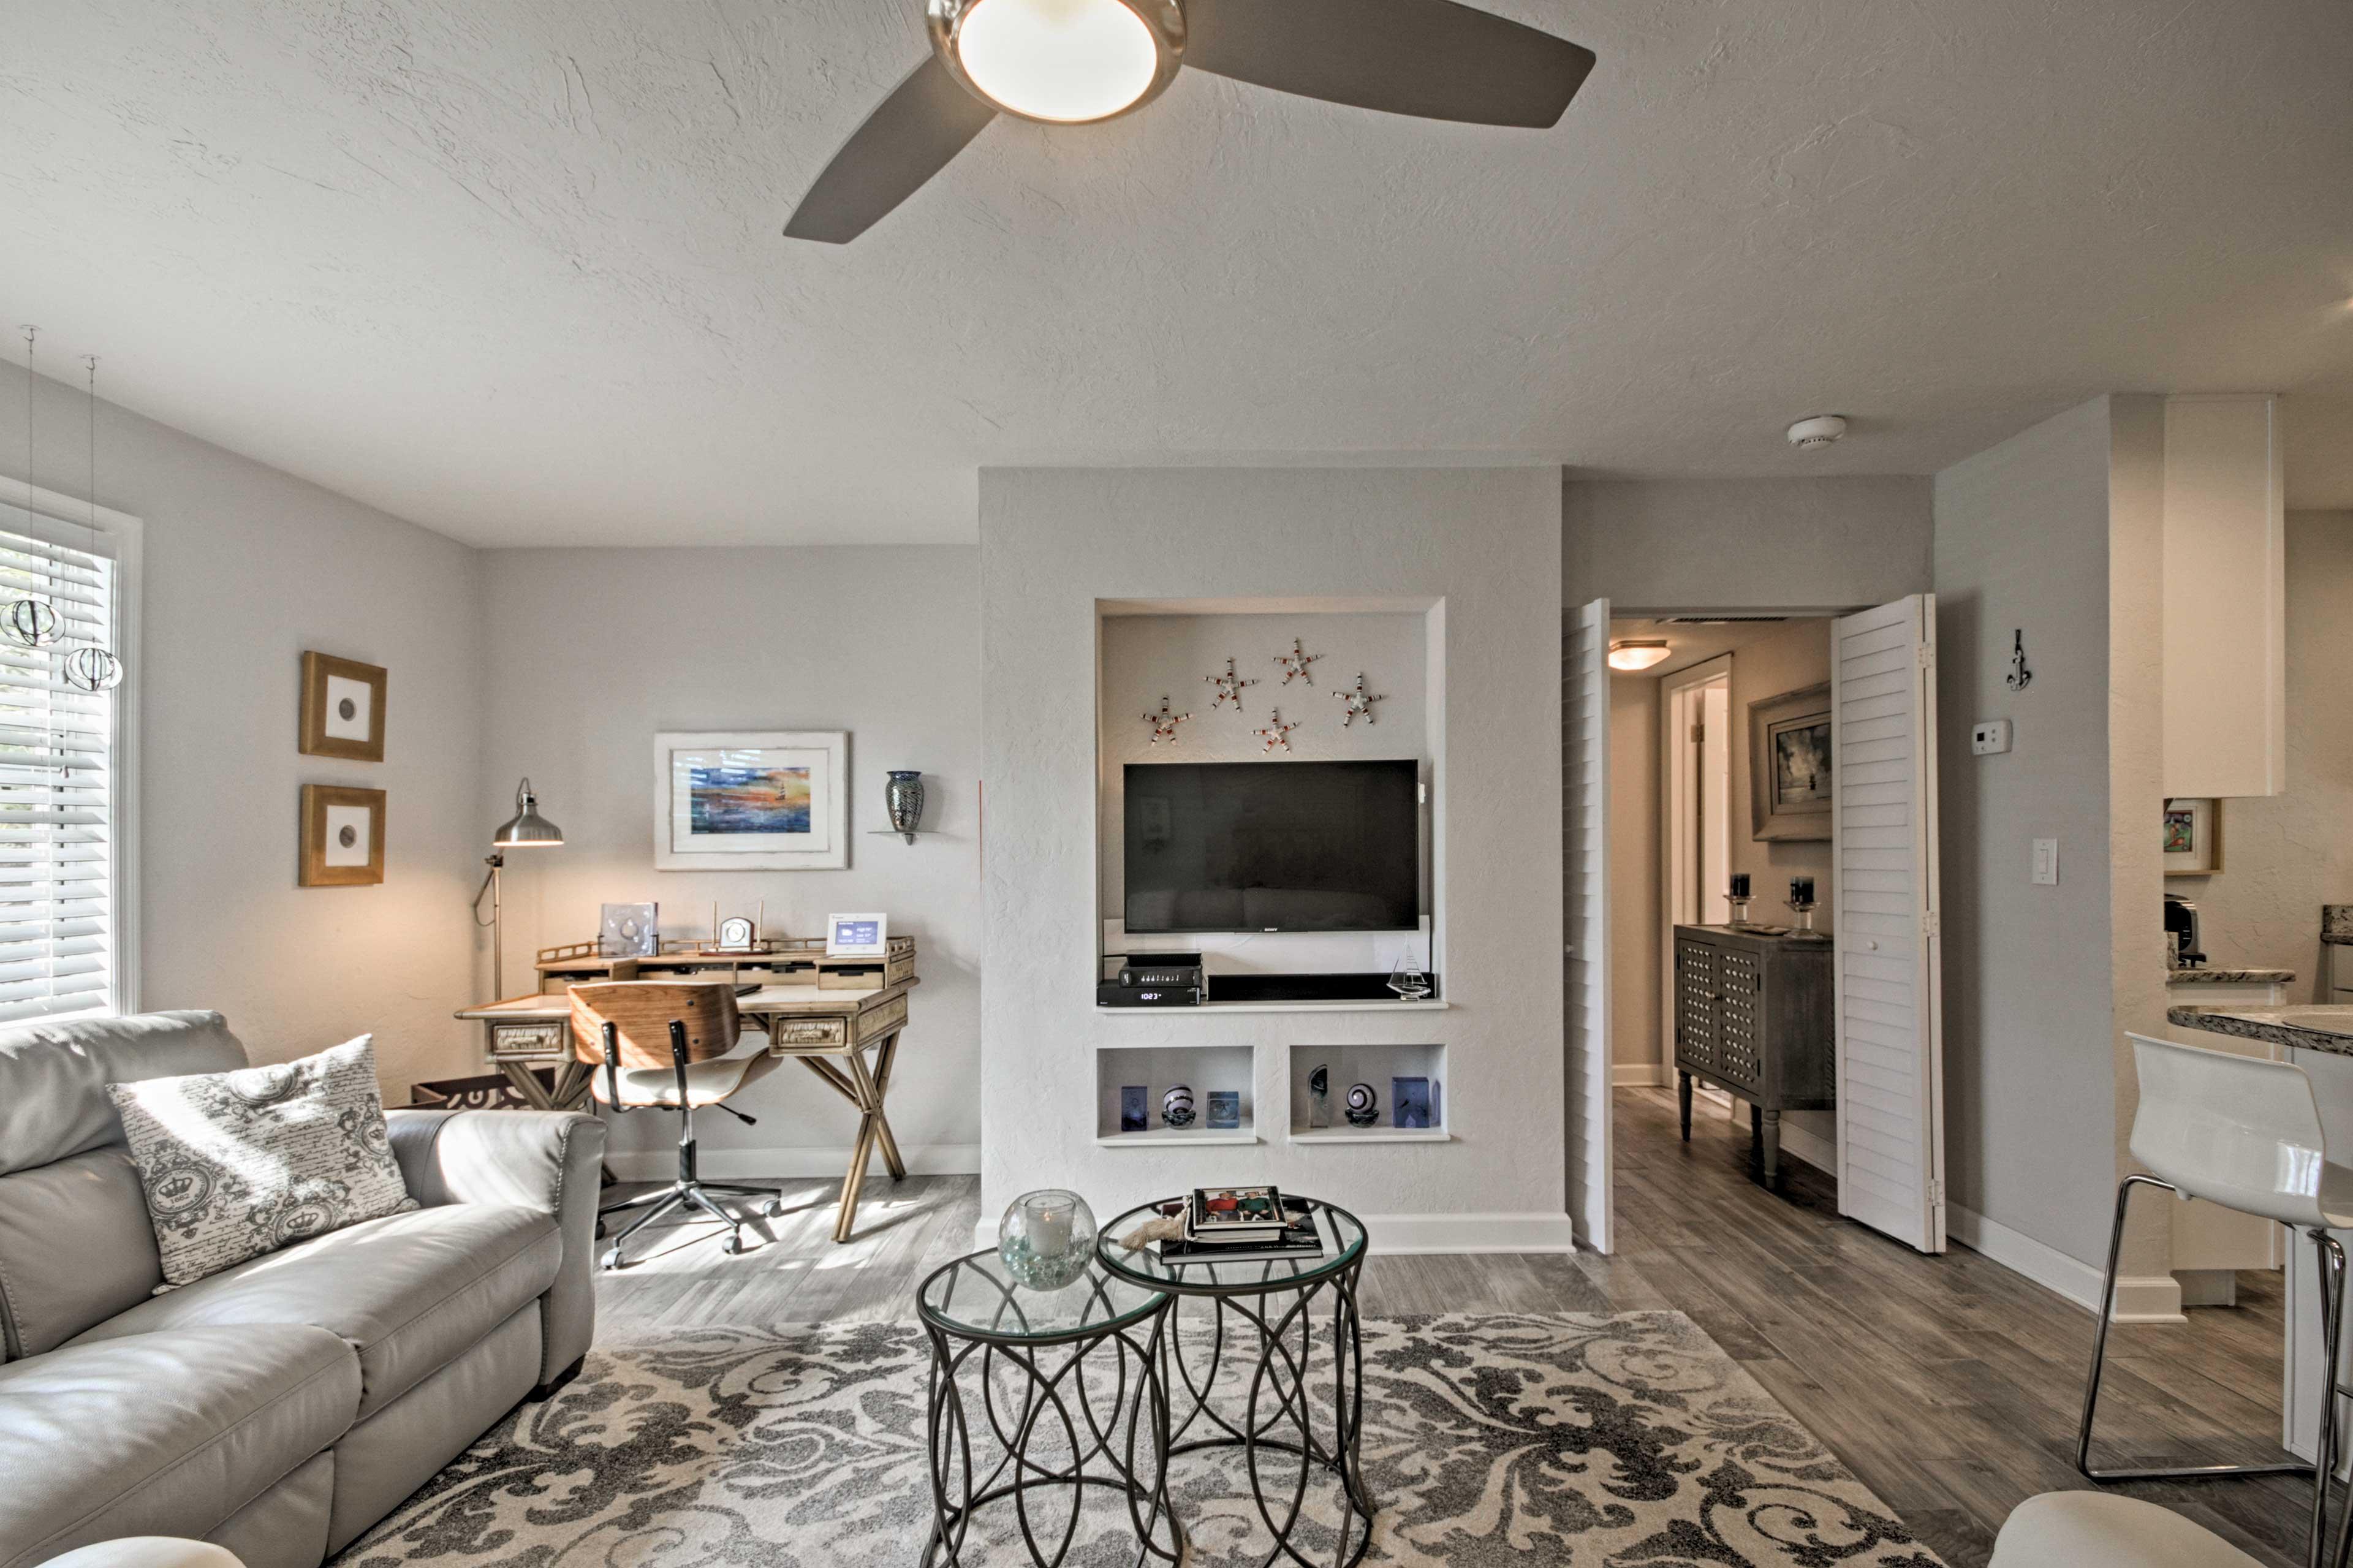 Easily communicate through the open-concept living area.